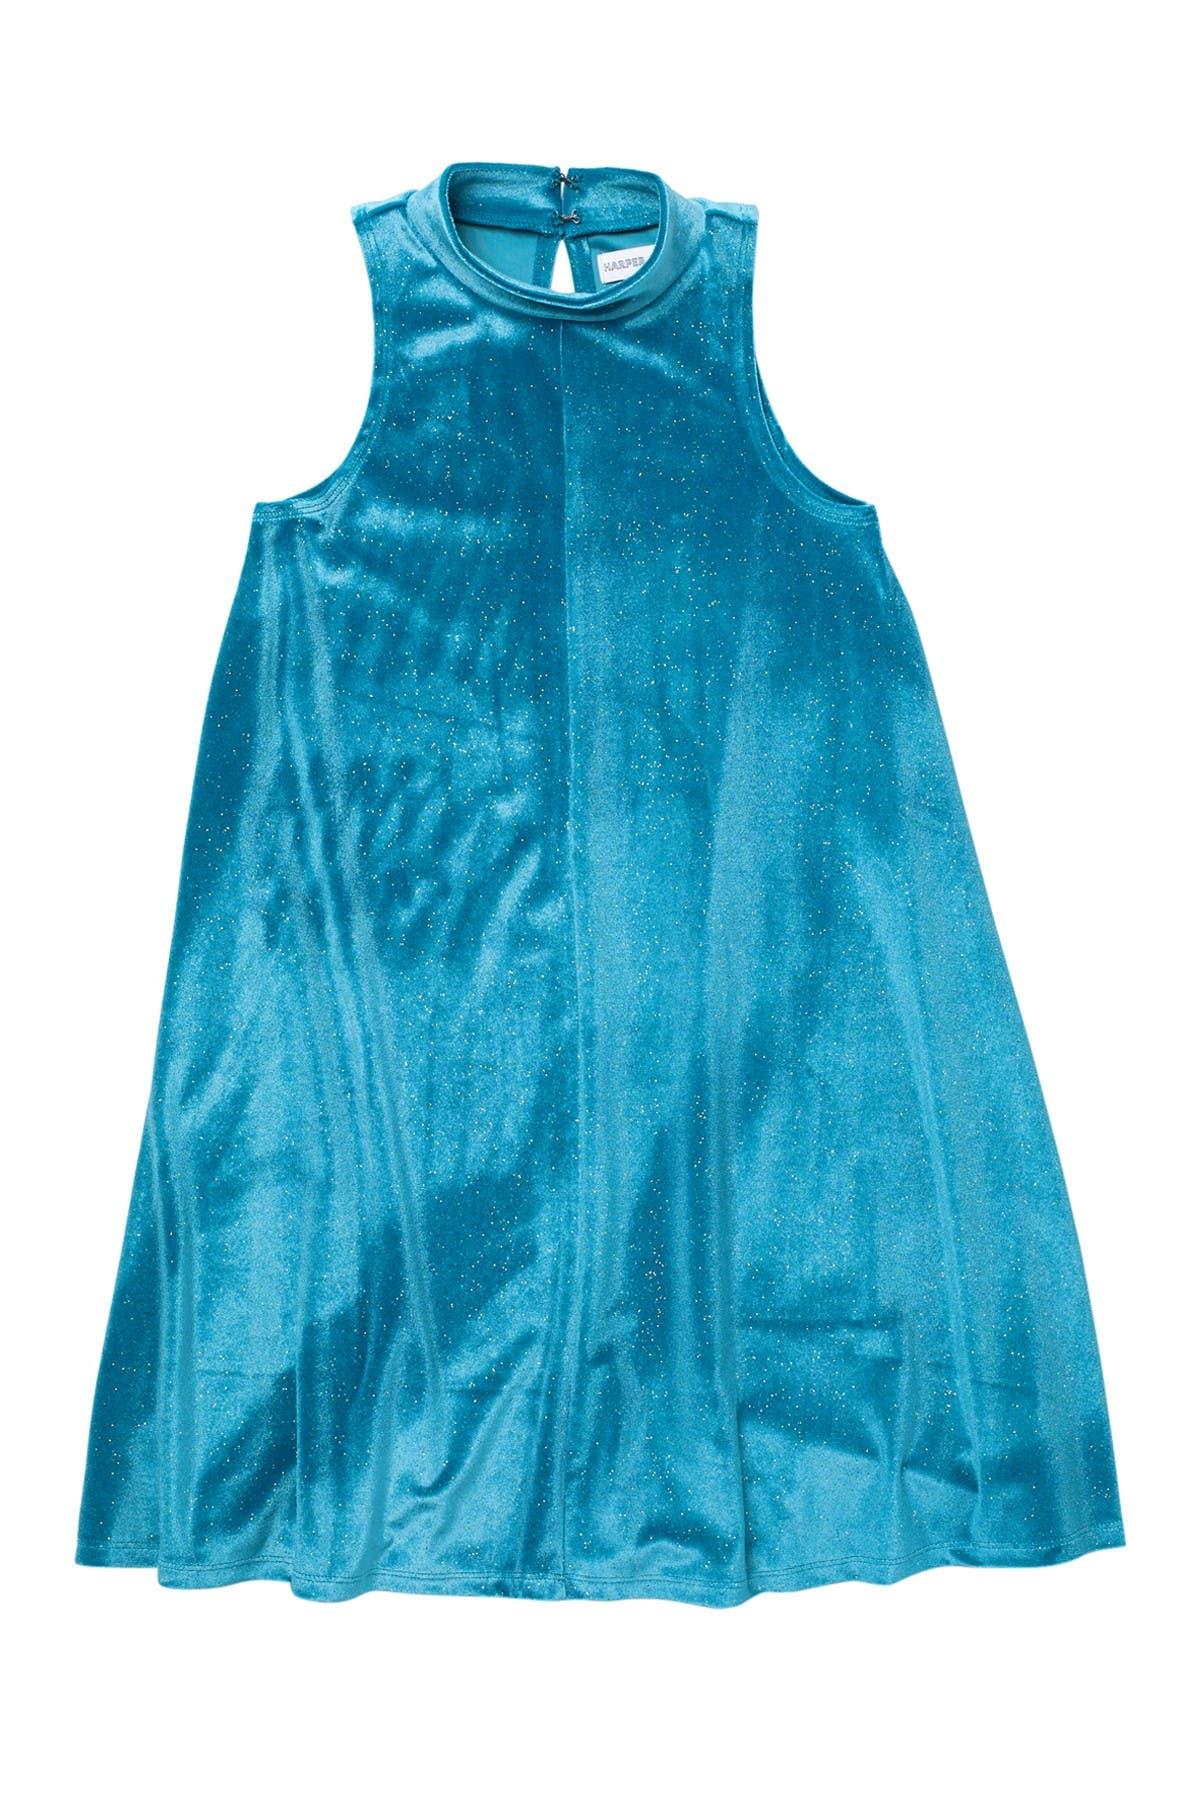 Image of Harper Canyon Mock Neck Sparkle Velour Dress